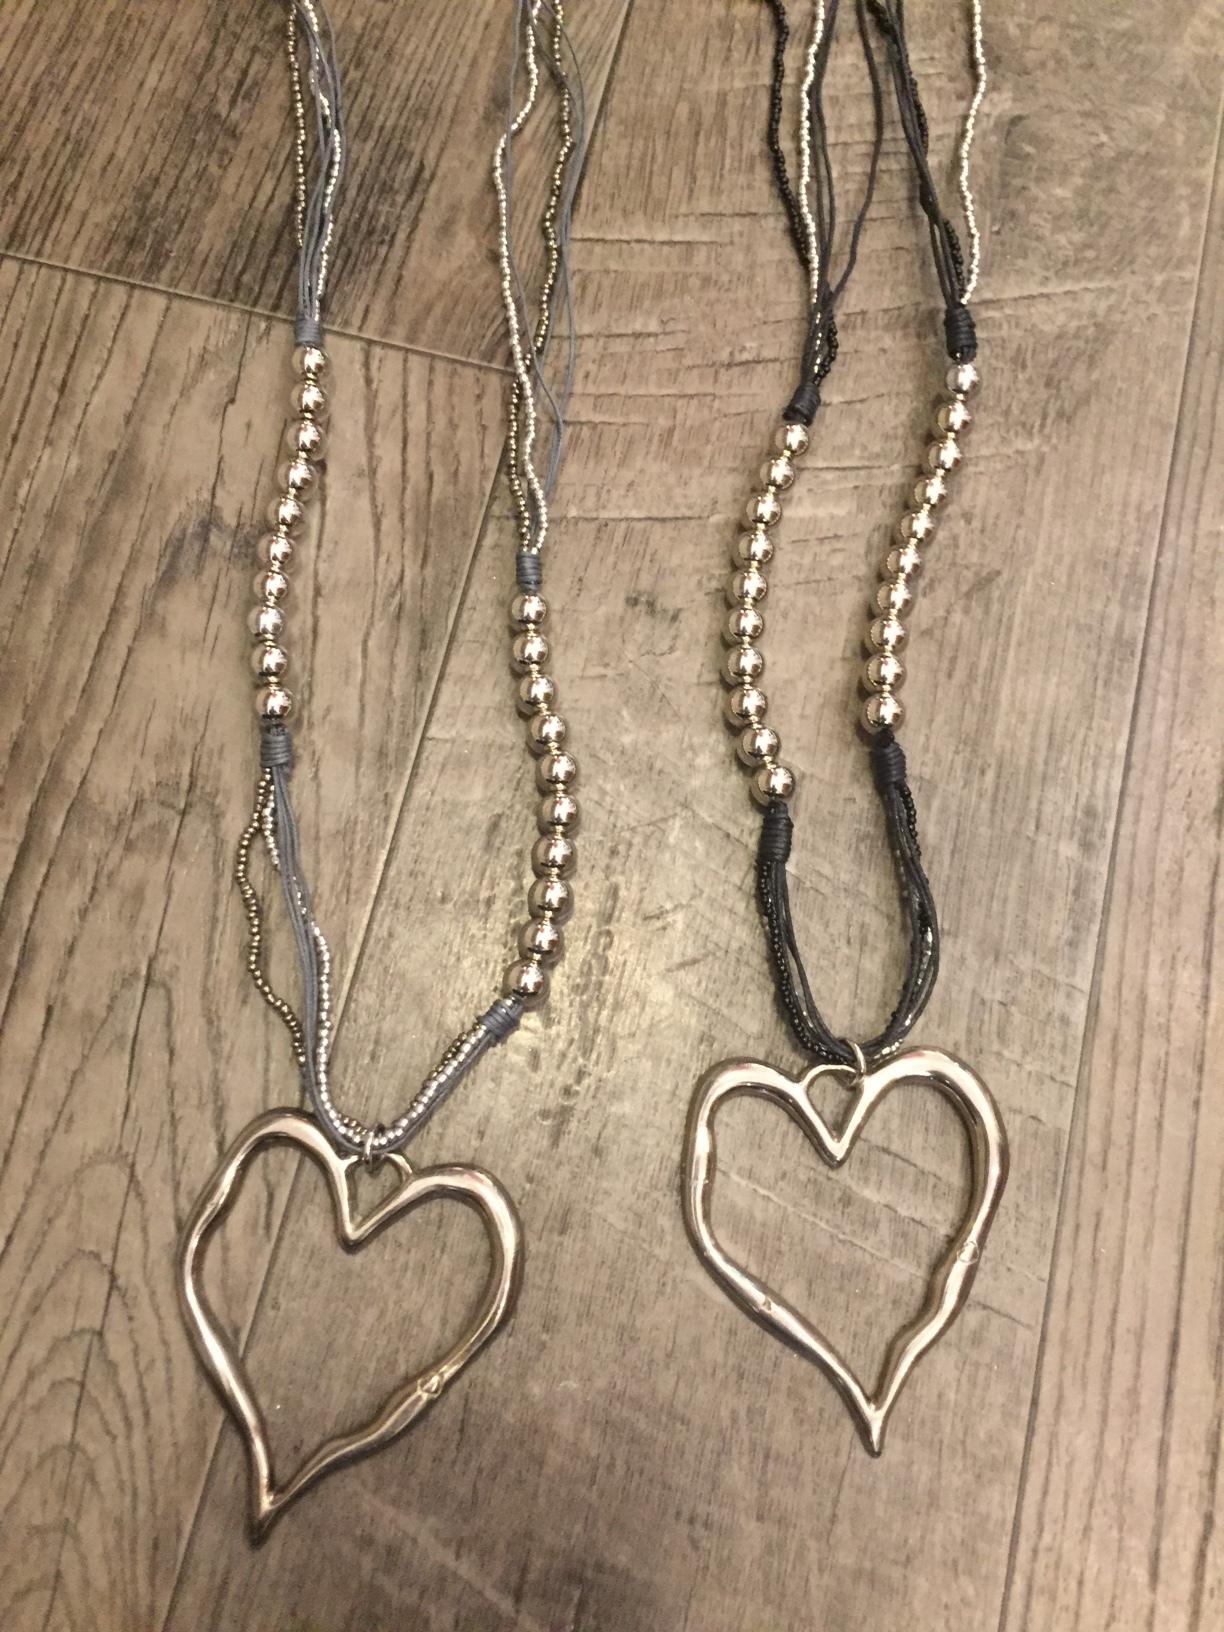 New jewelry! Called Suzie Blue, made in Bali, free trade3.JPG